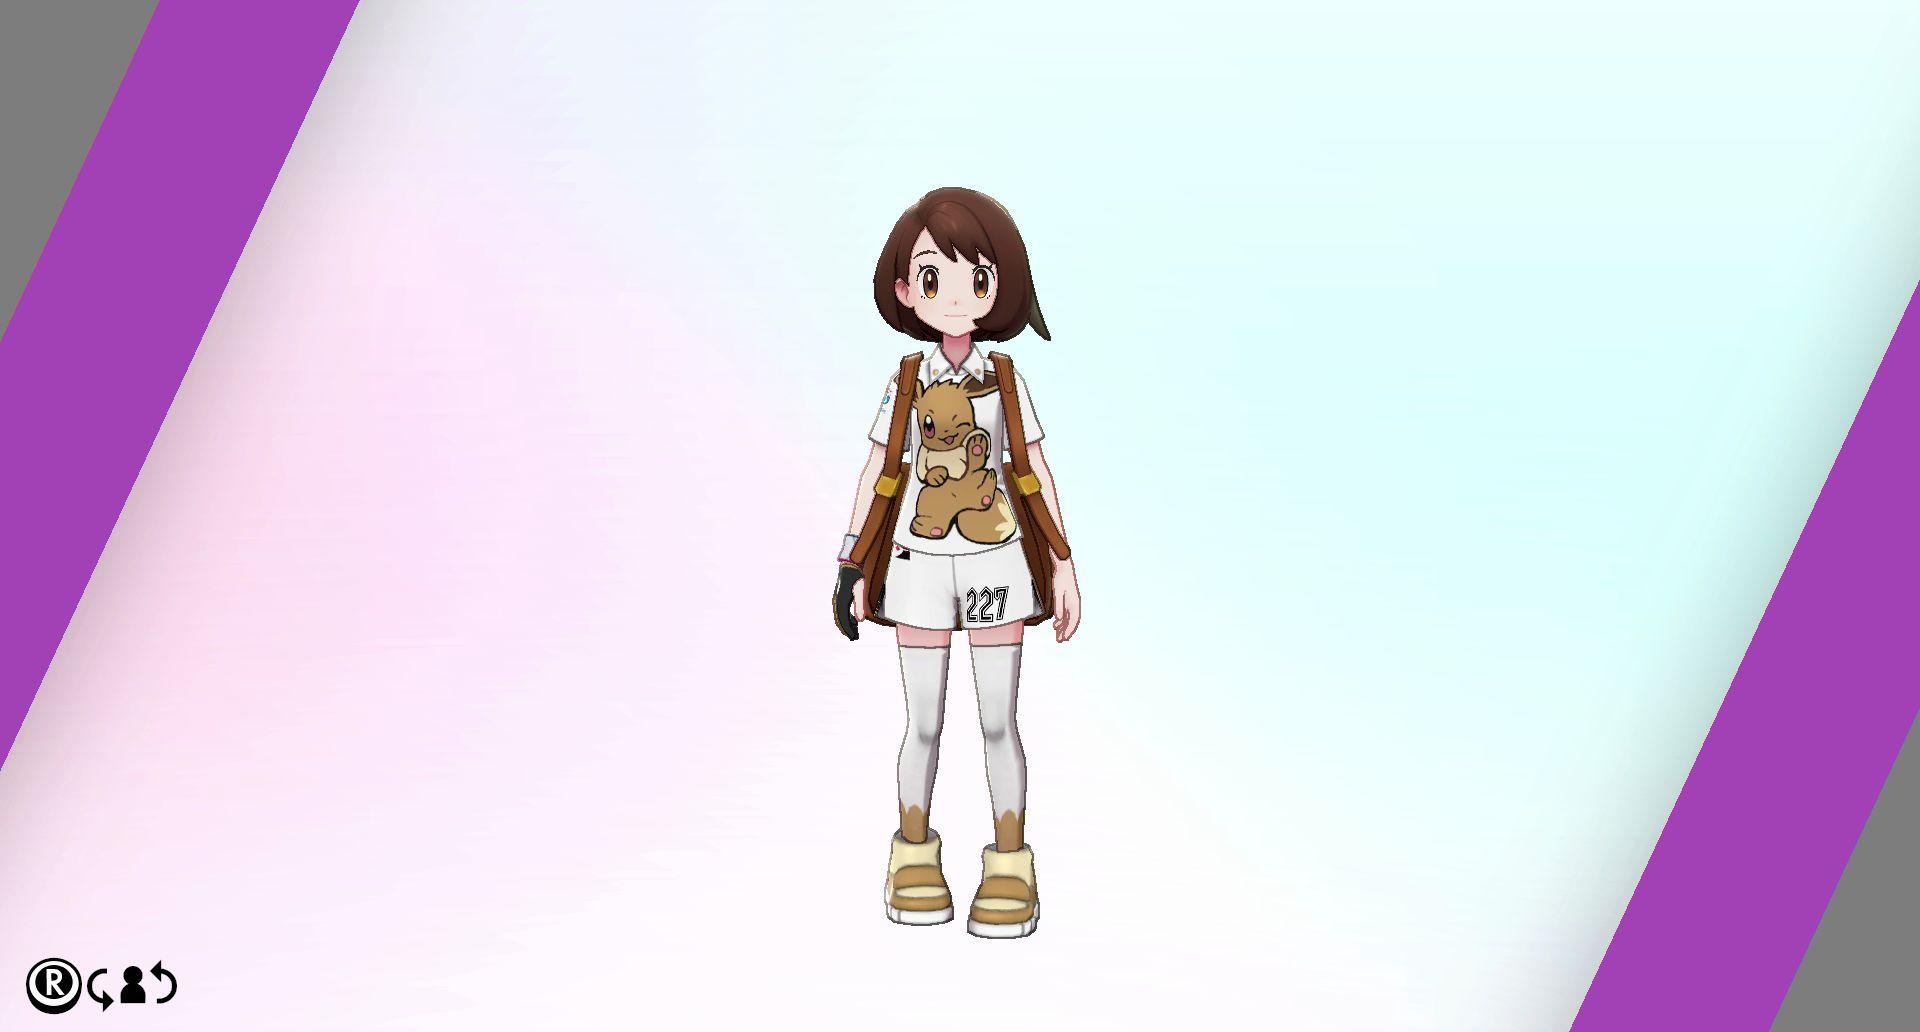 Pokemon-Sword-and-Shield_2020_01-09-20_019